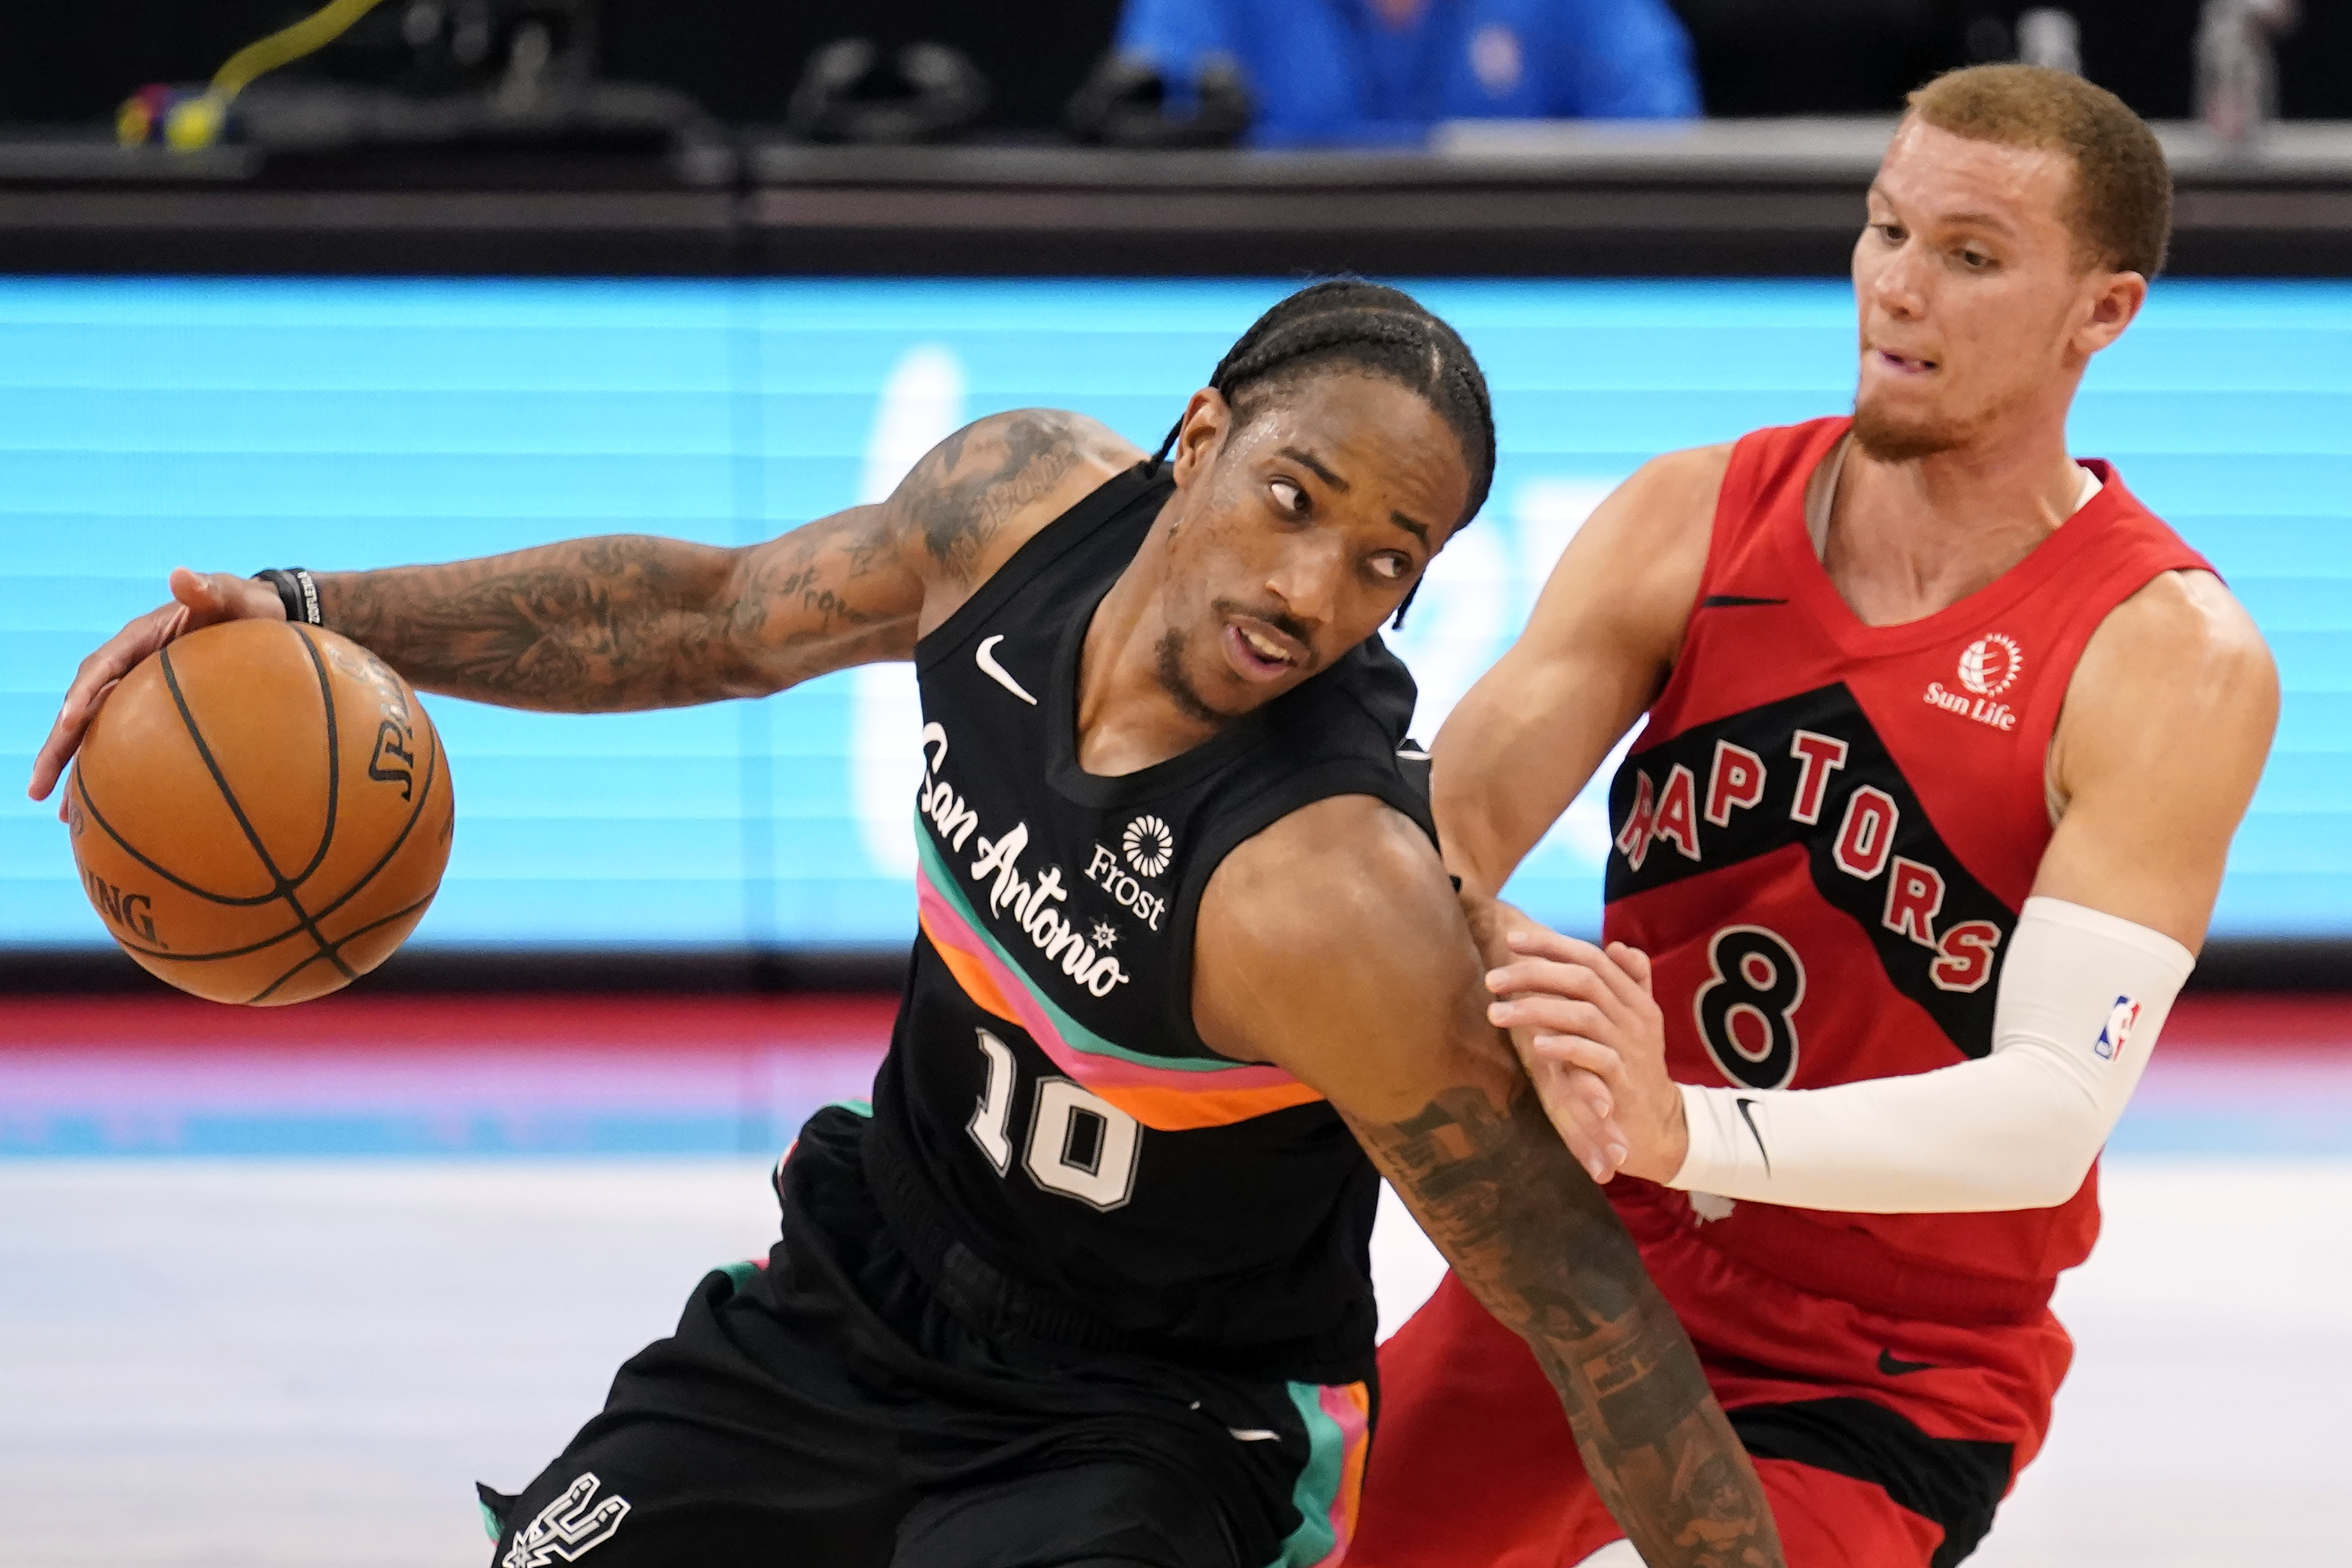 San Antonio Spurs forward DeMar DeRozan (10) drives around Toronto Raptors guard Malachi Flynn (8) during the second half of an NBA basketball game Wednesday, April 14, 2021, in Tampa, Fla.